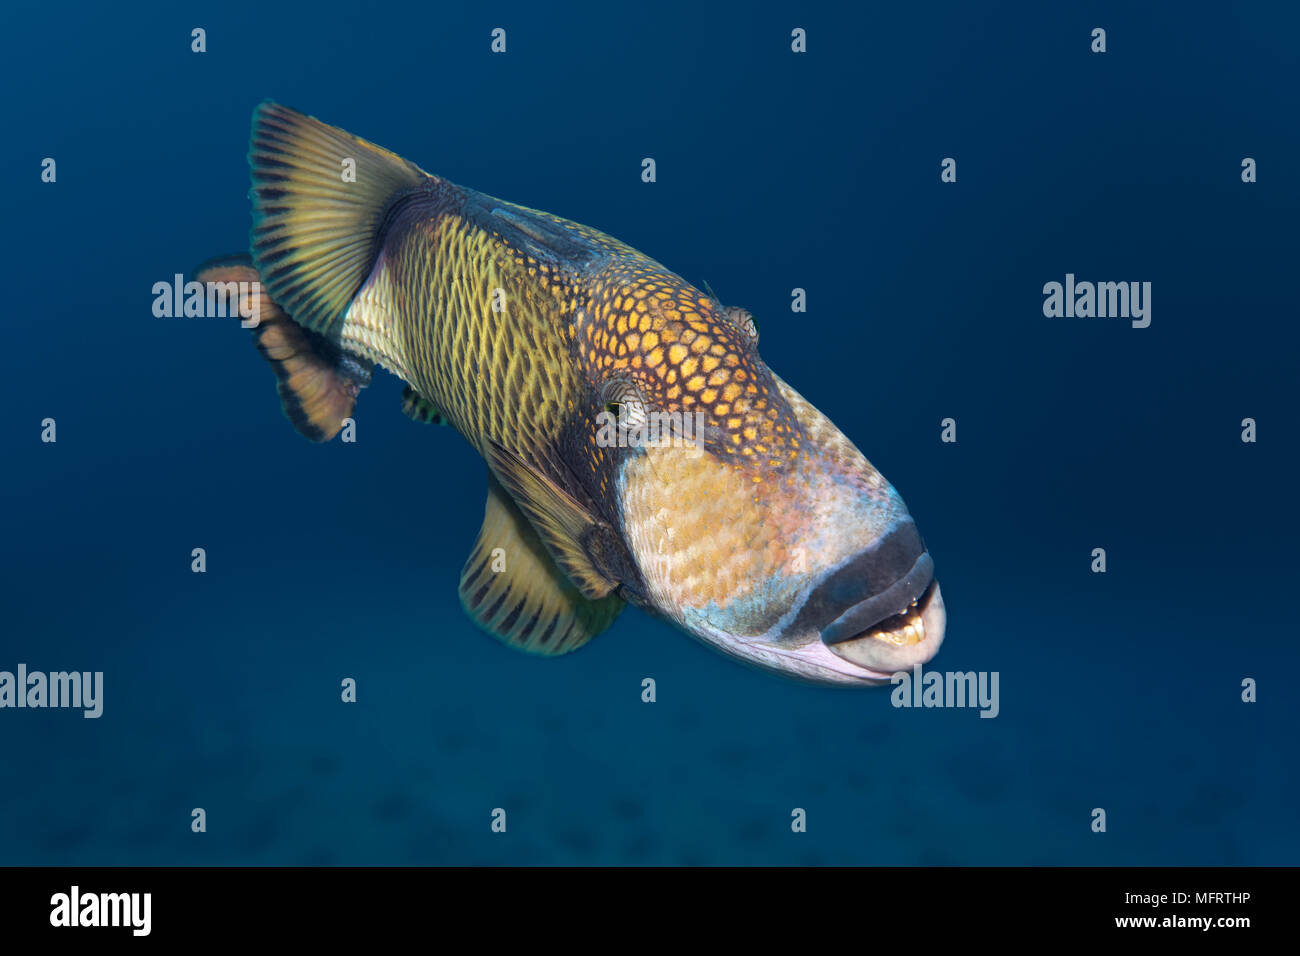 Titan triggerfish (Balistoides viridescens), Indian Ocean, Maldives - Stock Image